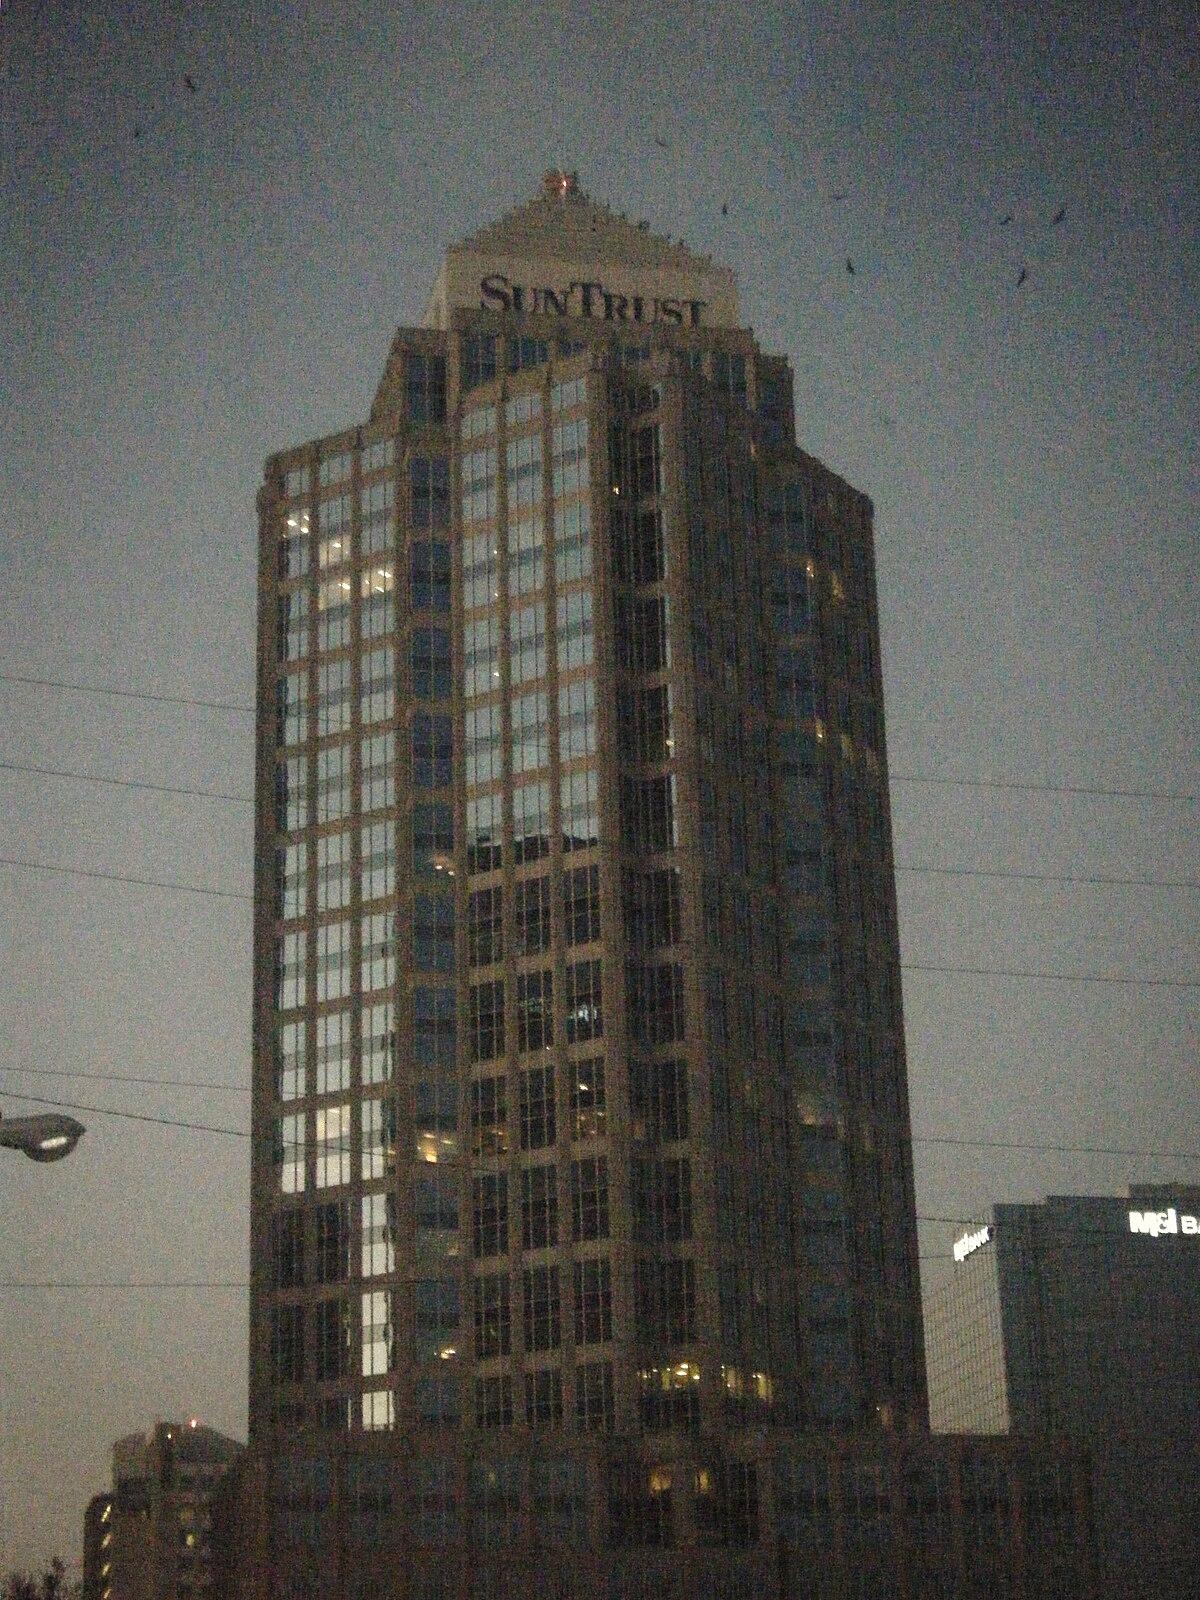 Suntrust Financial Centre Wikipedia